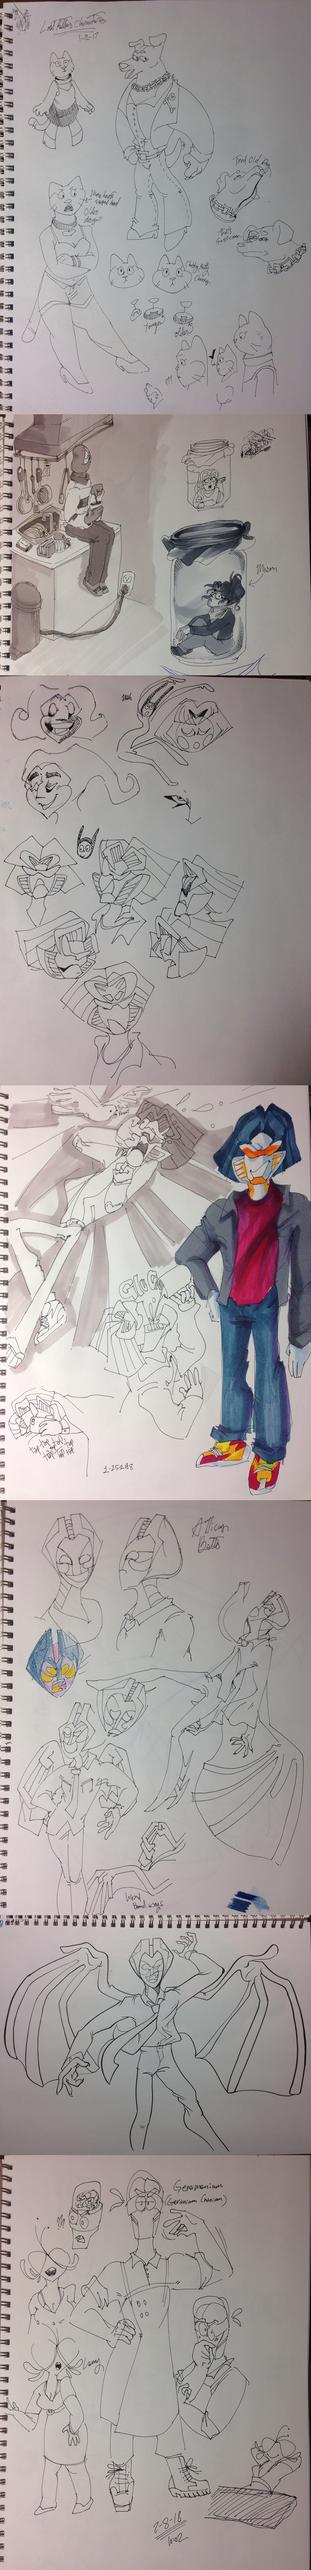 Random Doodles 687 by AgentBlackBlood